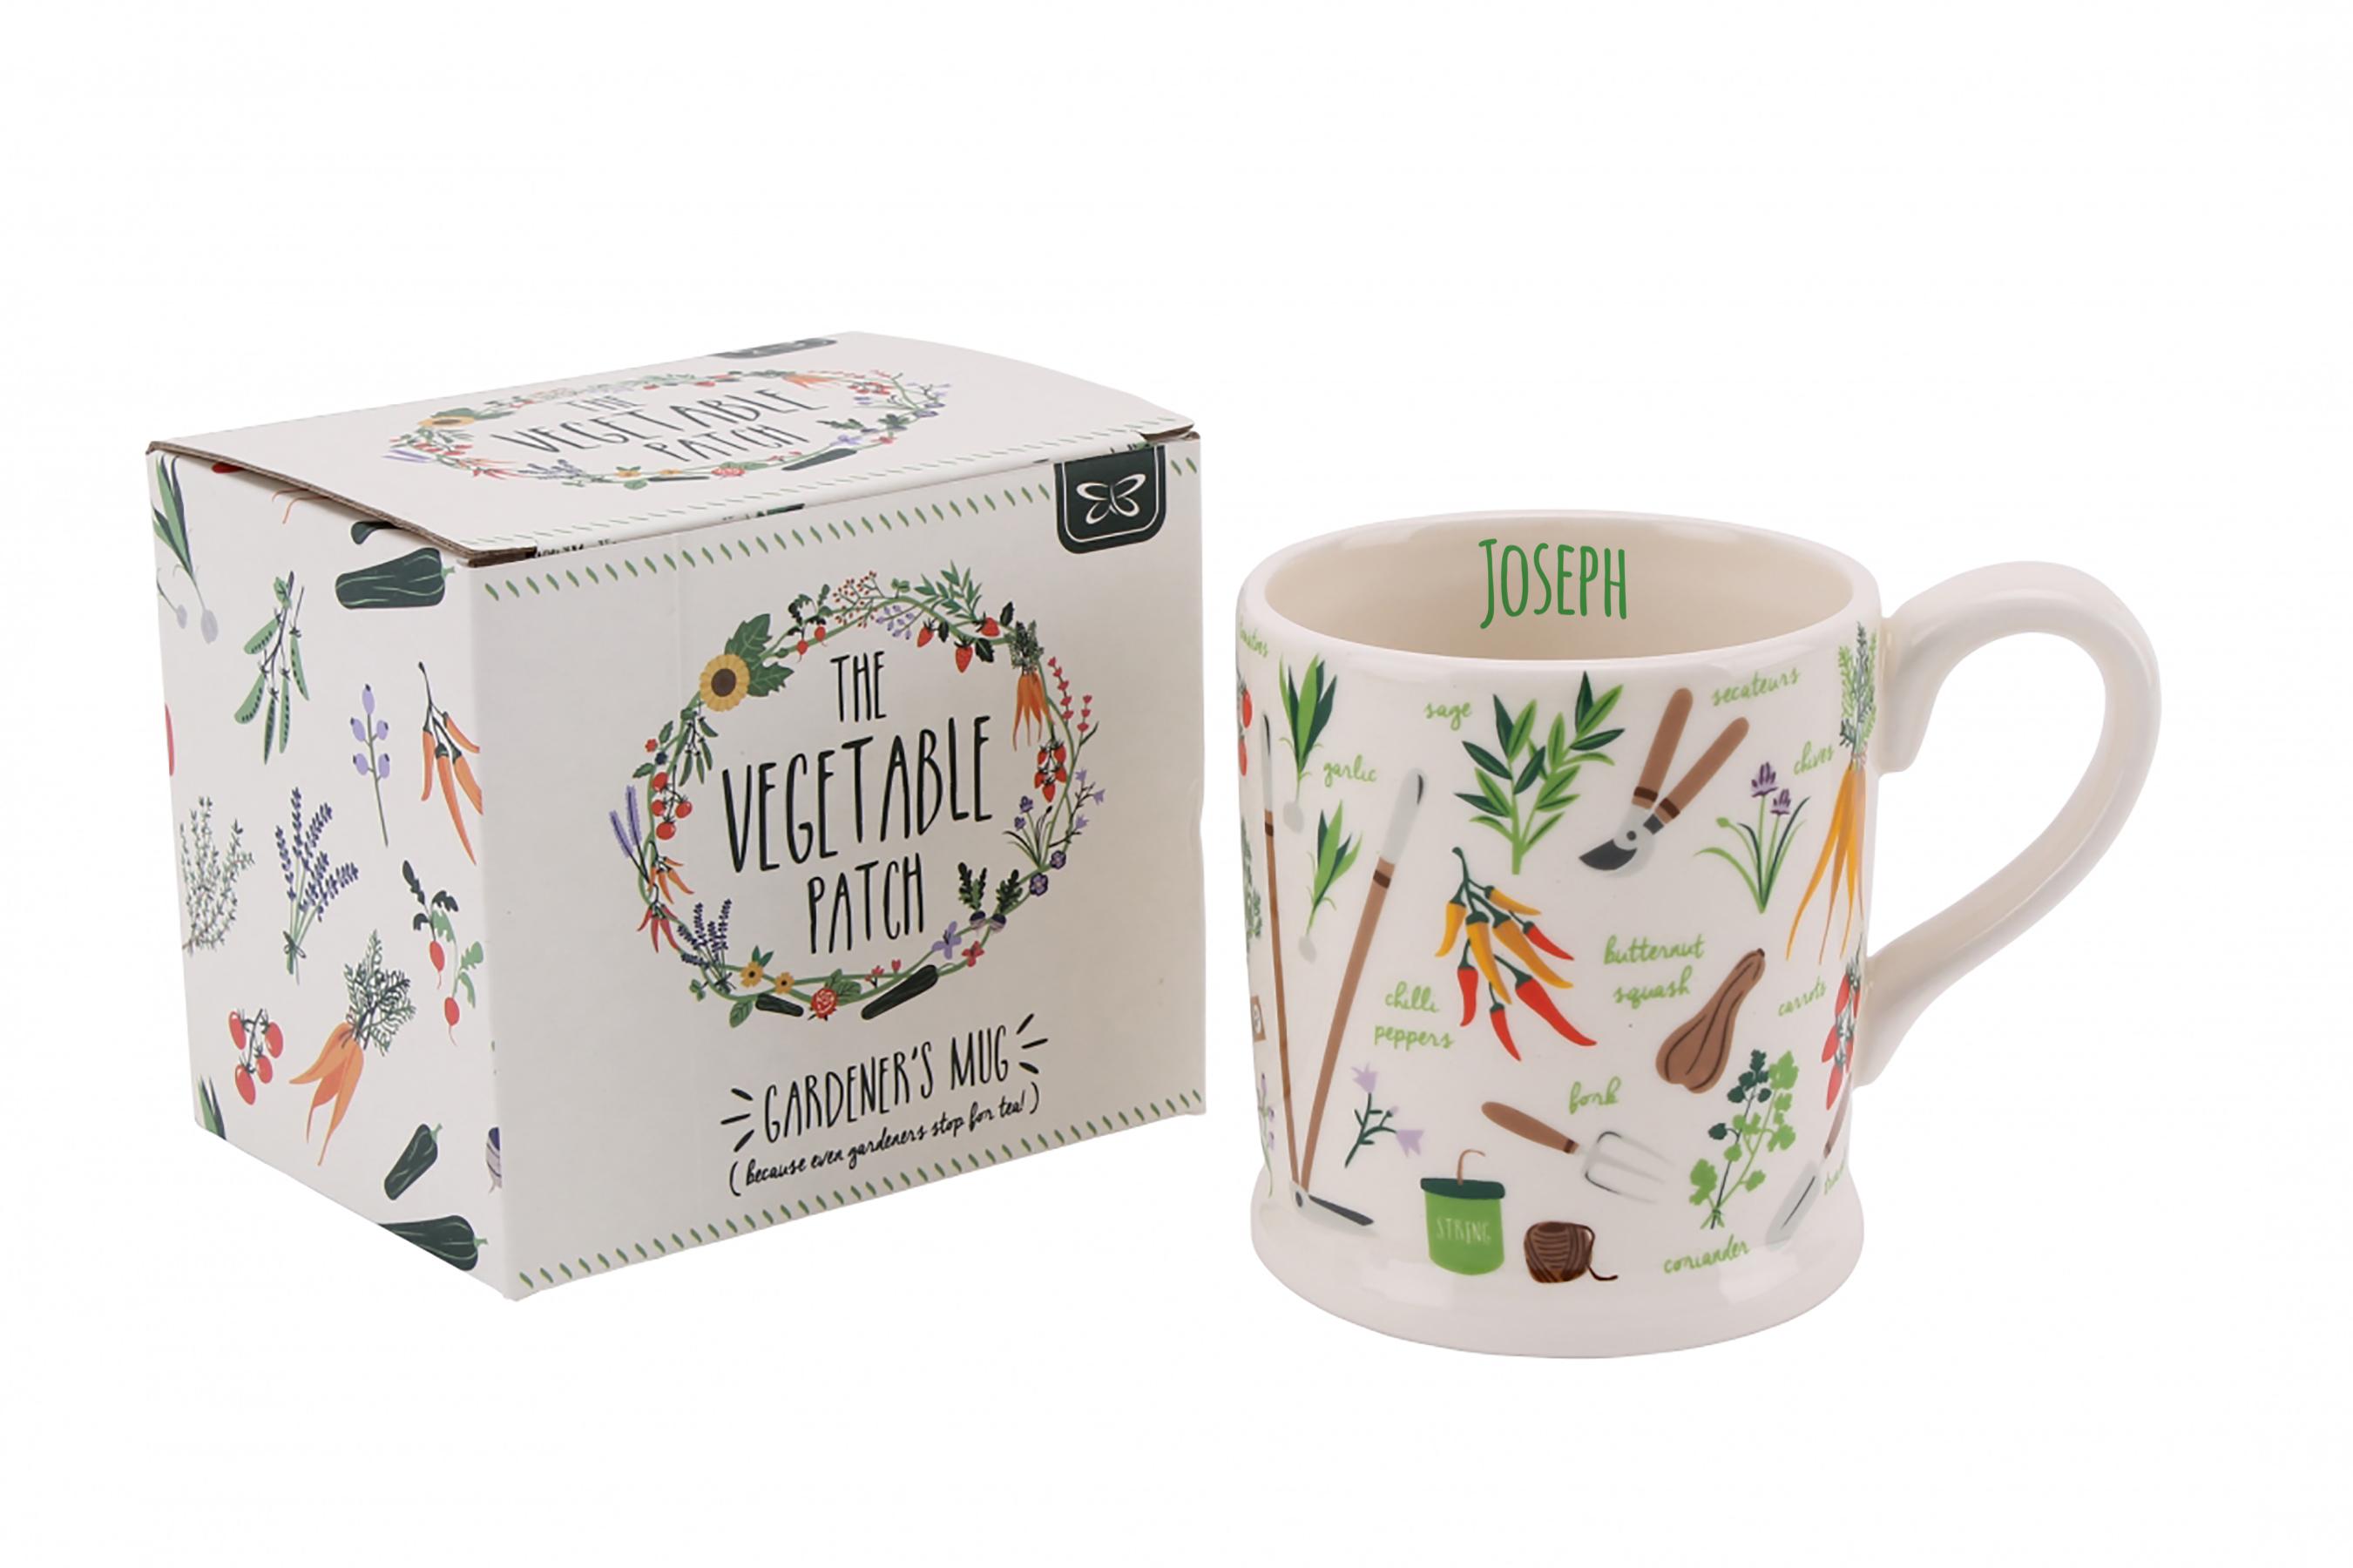 Vegetable Patch Mug